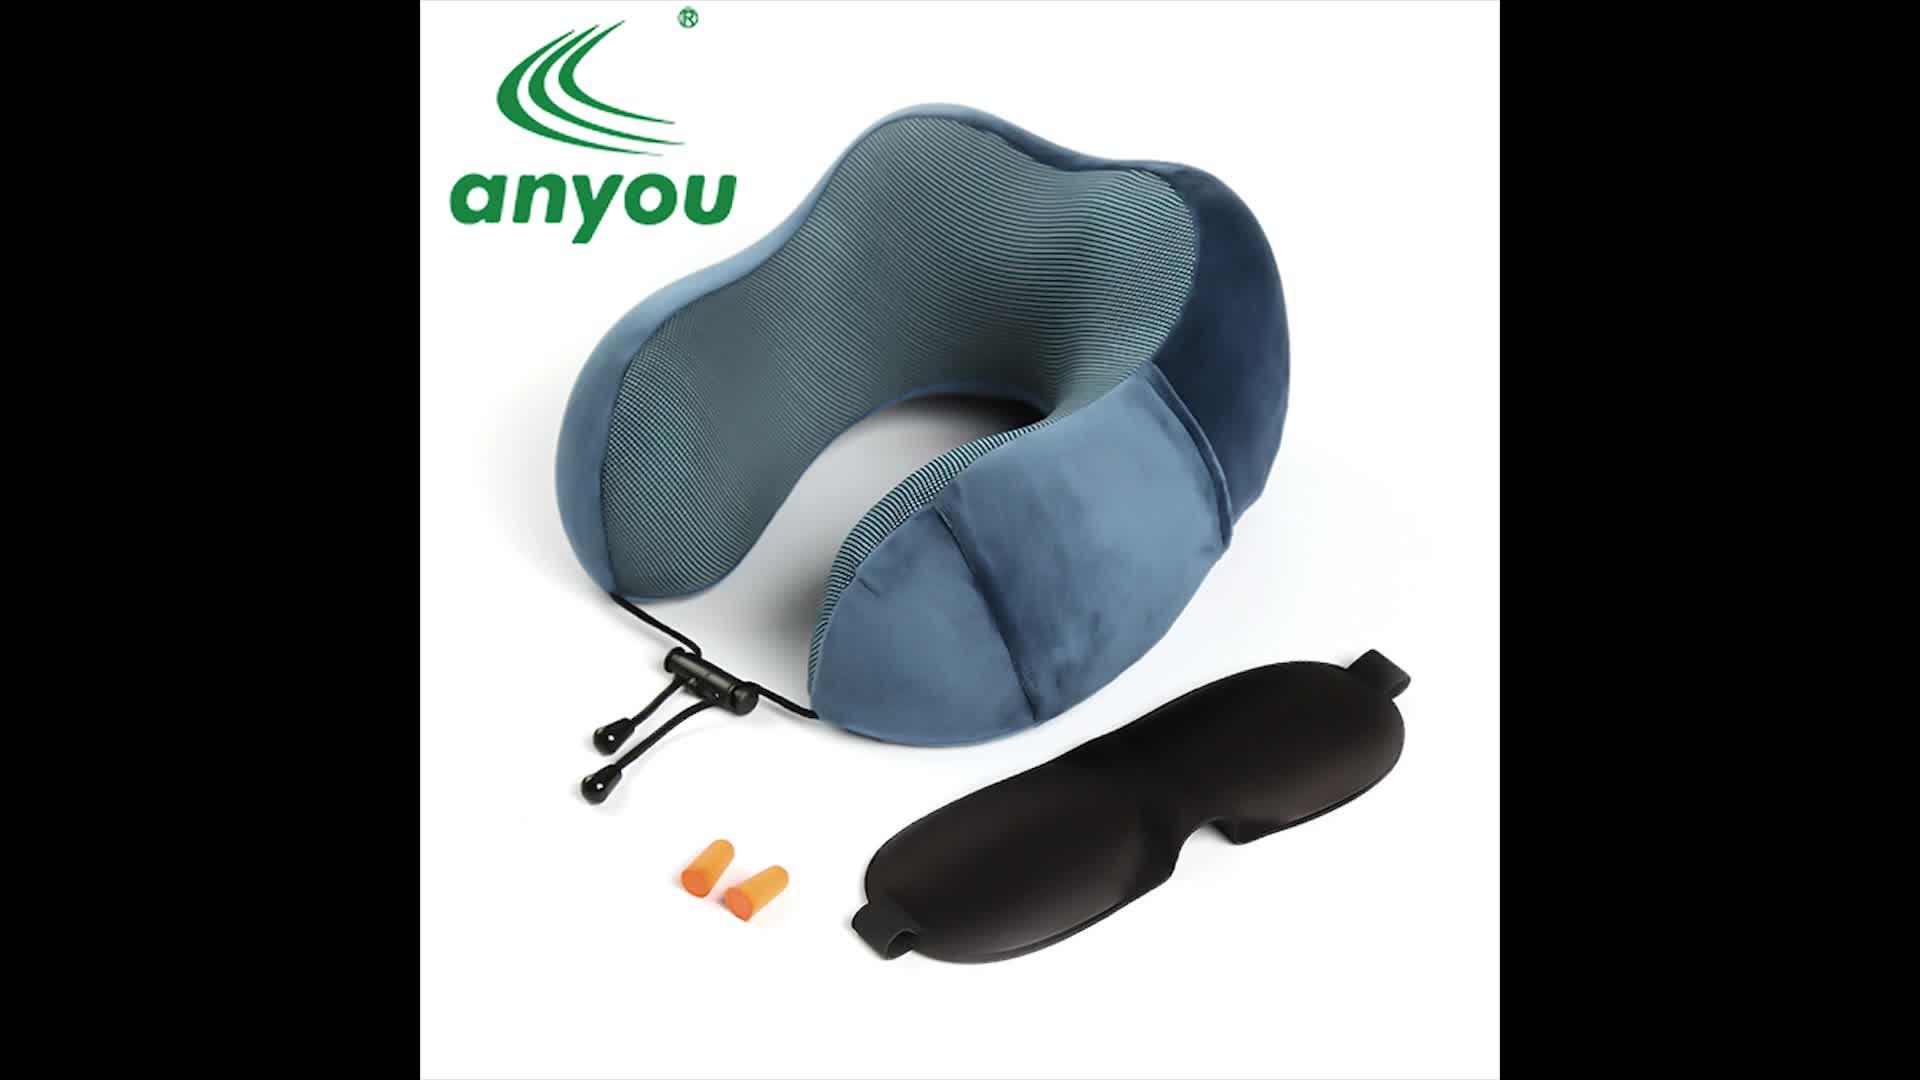 Wholesale Amazon Golden Supplier Memory Foam car Airplane Neck support pillow Travel Neck Pillow